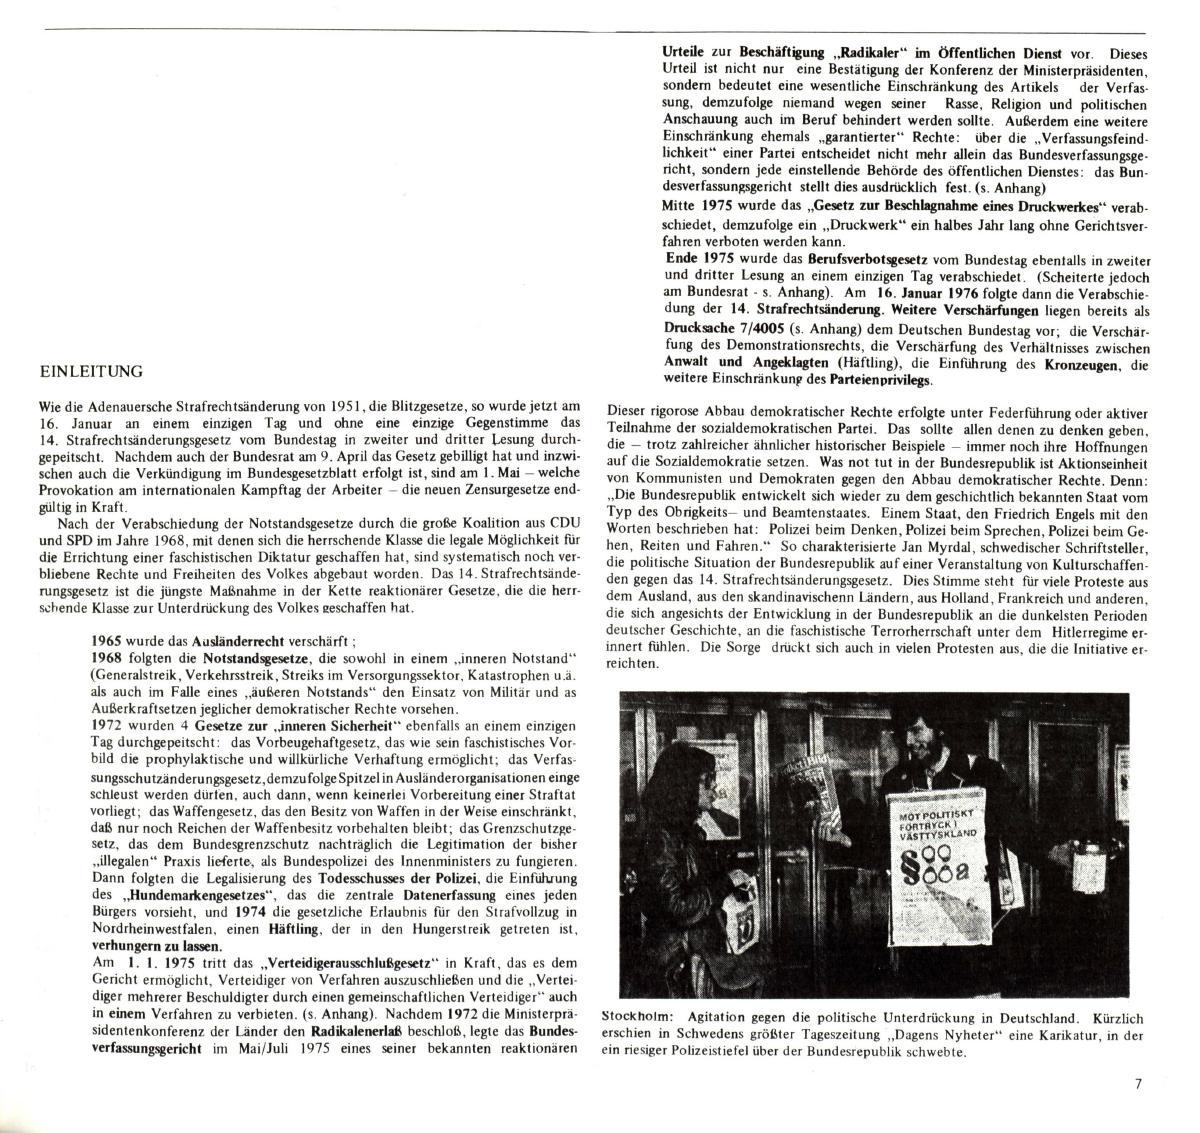 REP_VLB_1976_Die_Zensurgesetze_08